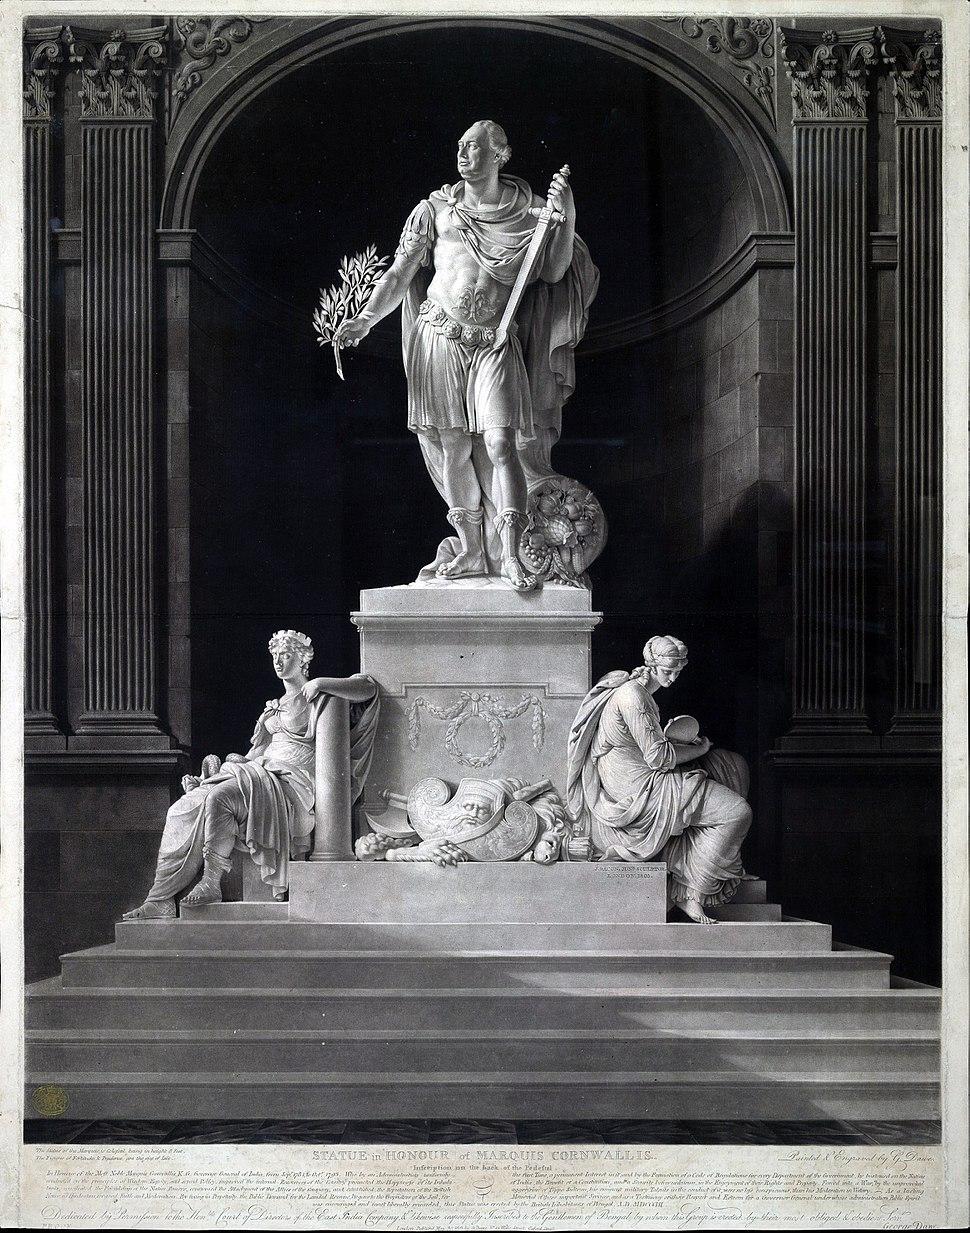 CornwallisCalcuttaStatue